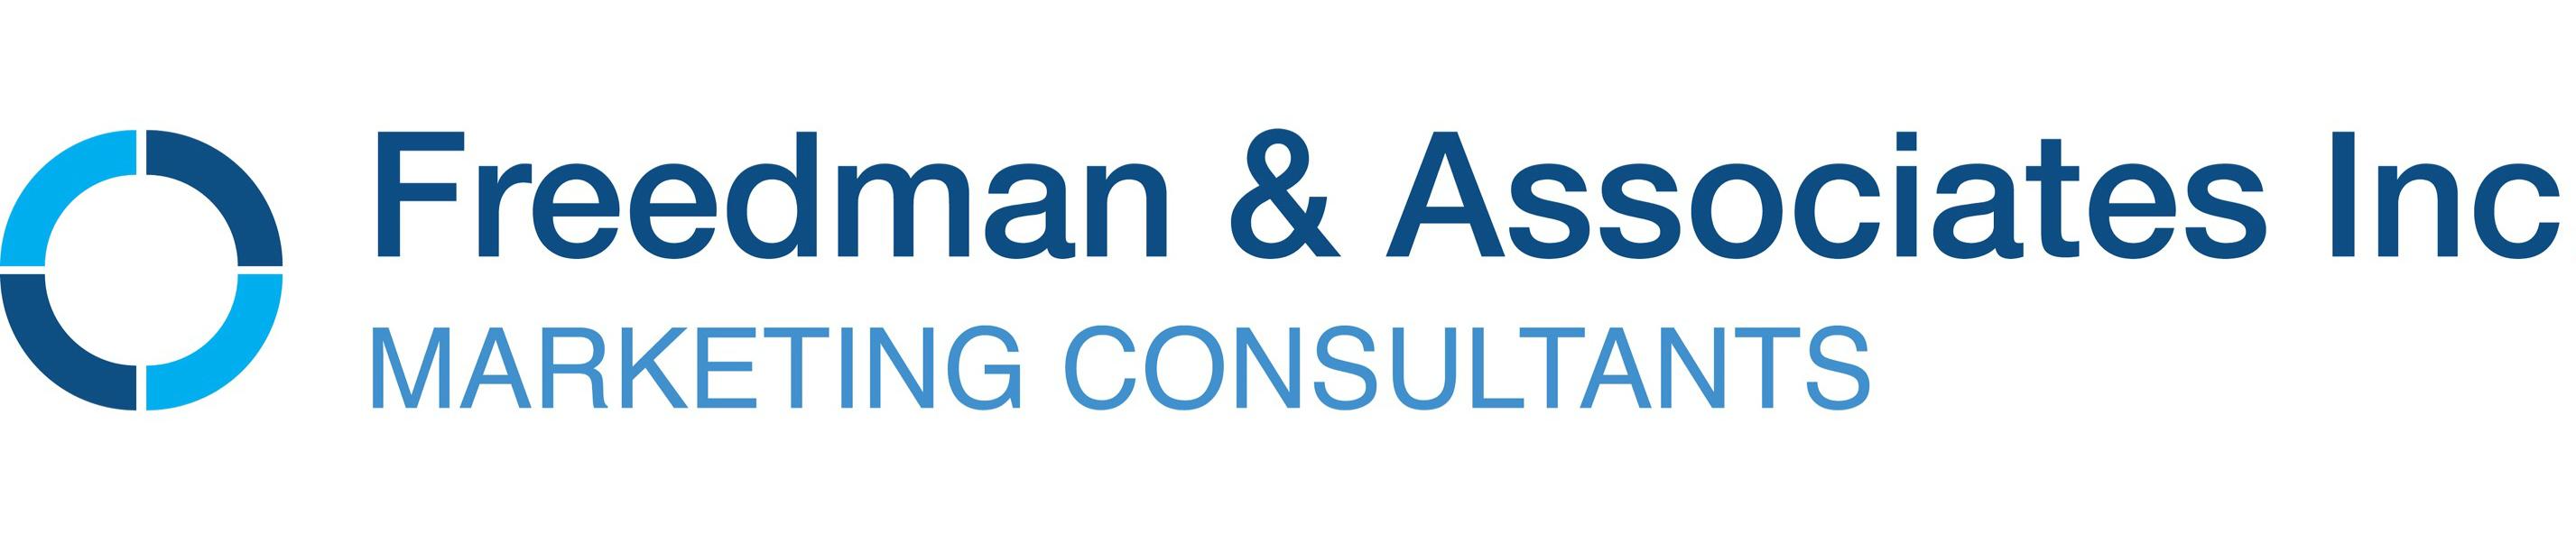 Freedman & Associates